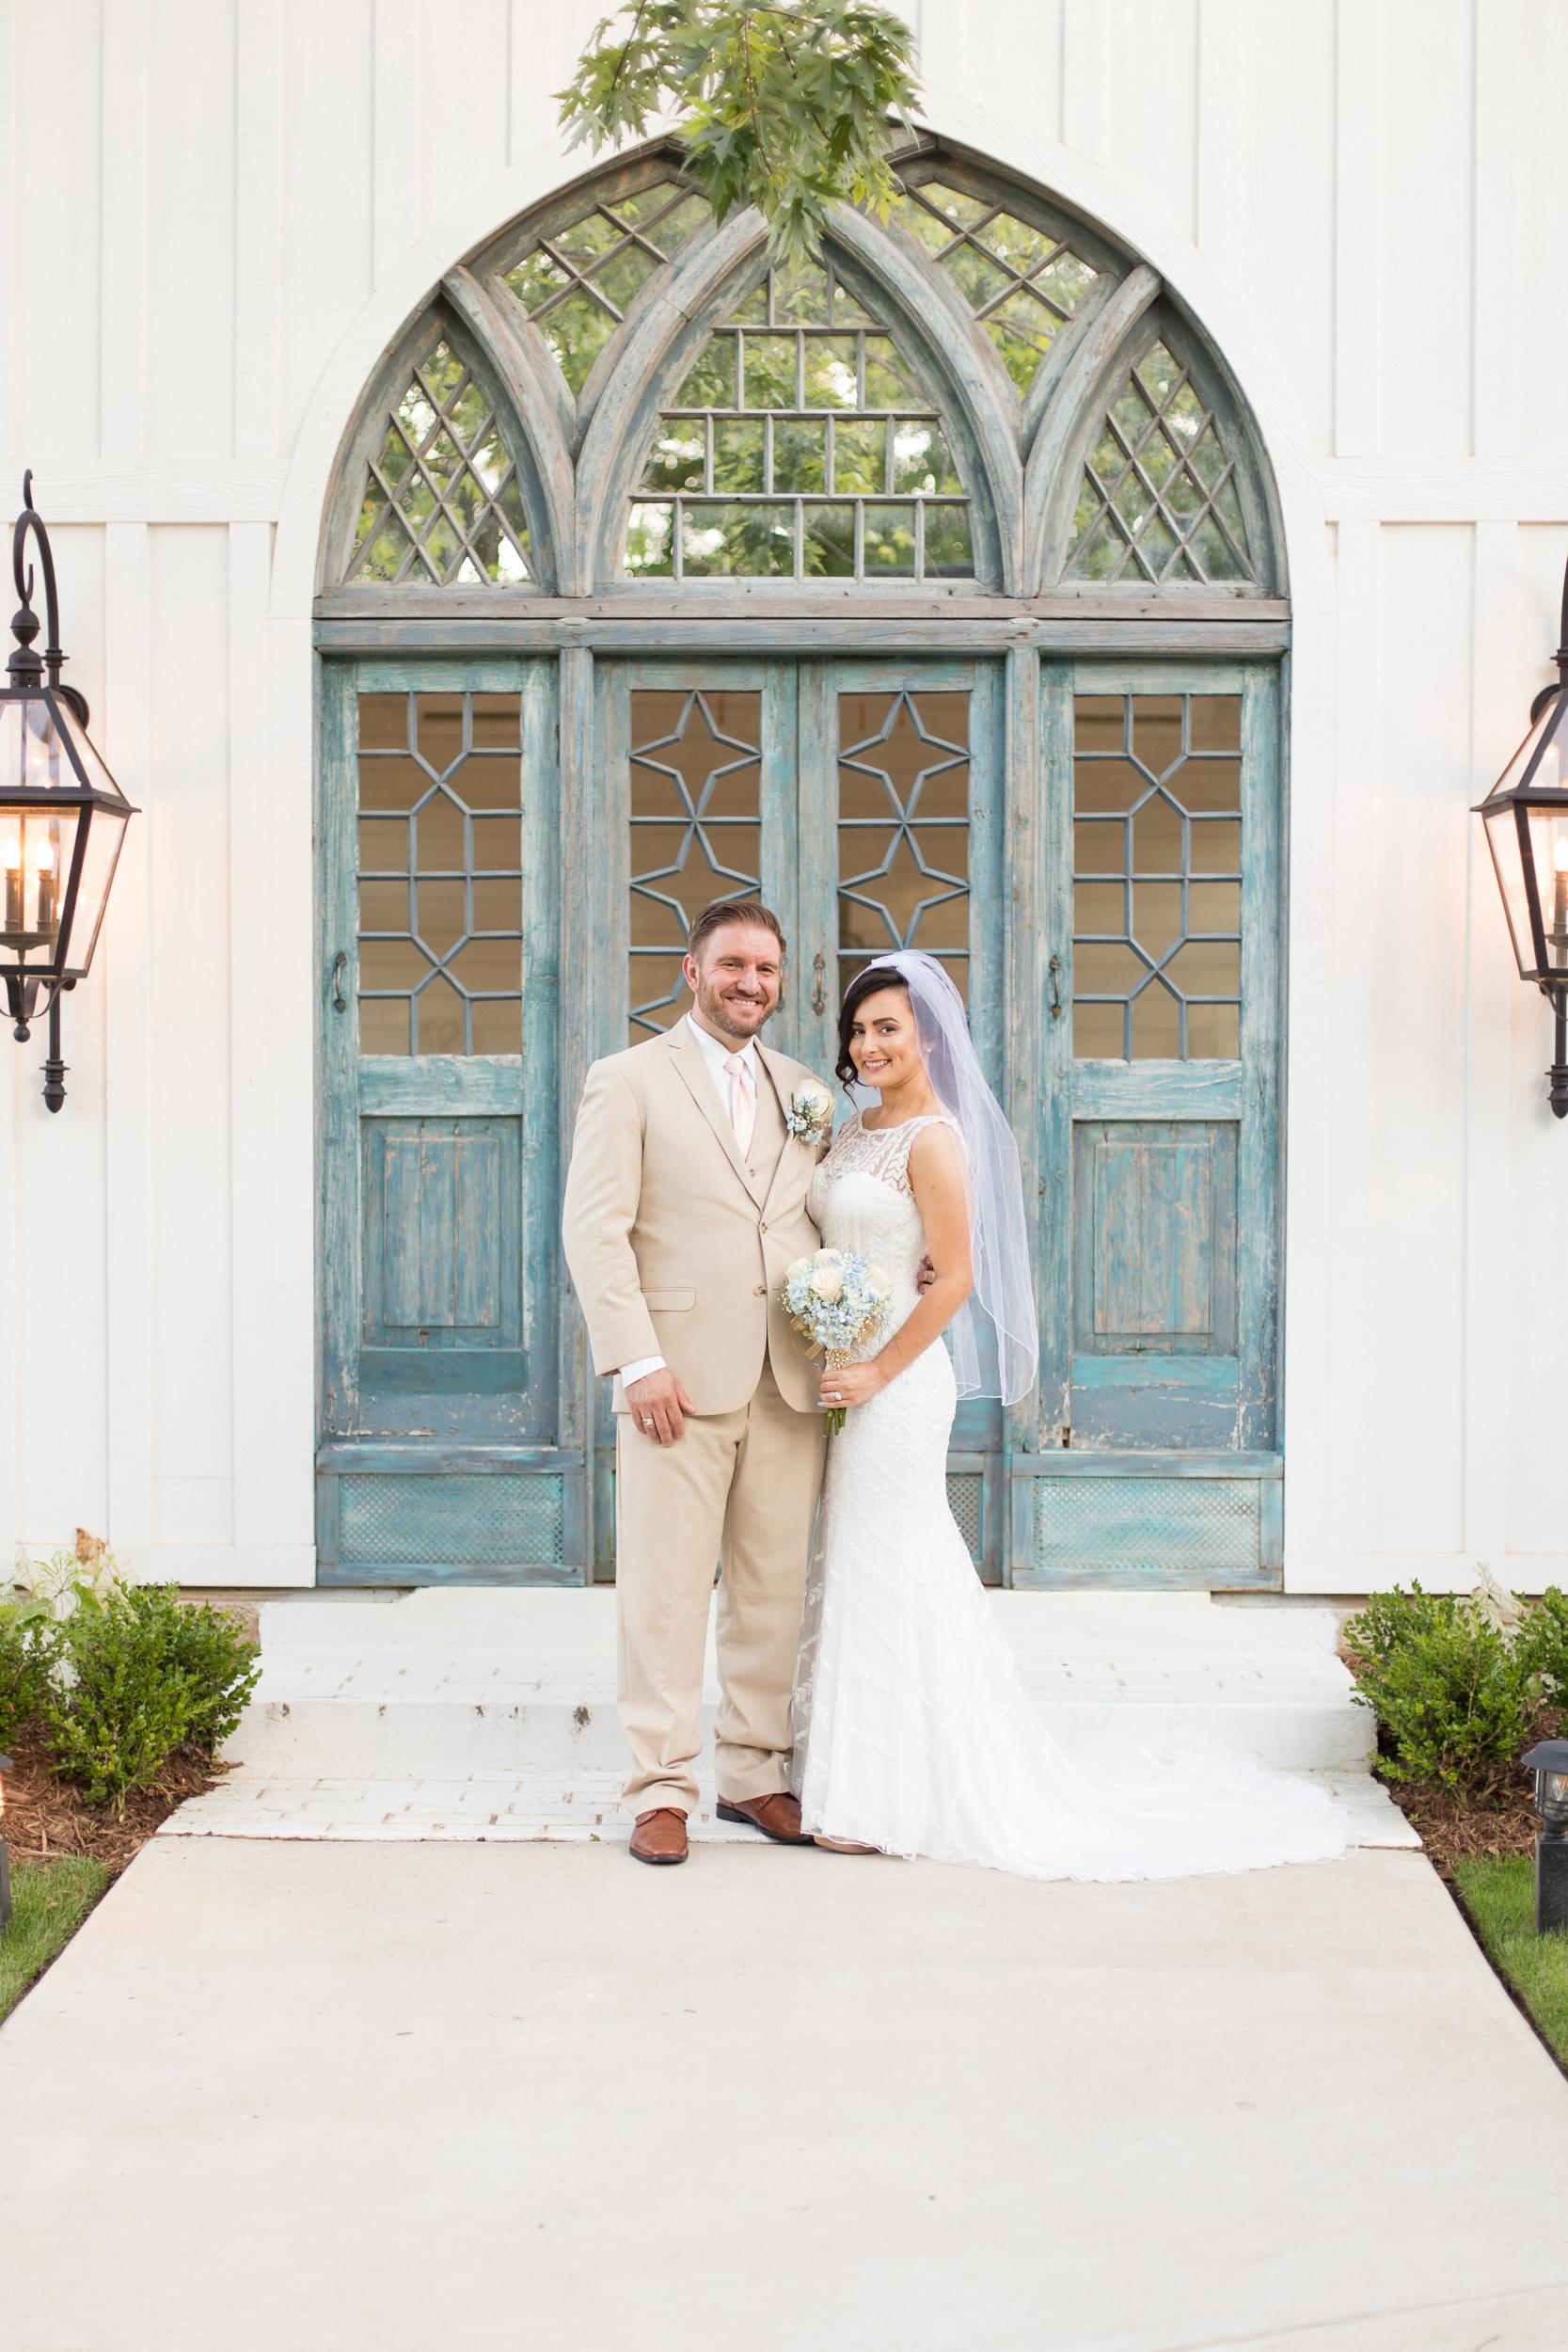 Zihlman-East TX Wedding_Kelsie Hendricks Photography_The Folmar Tyler Texas-113.jpg